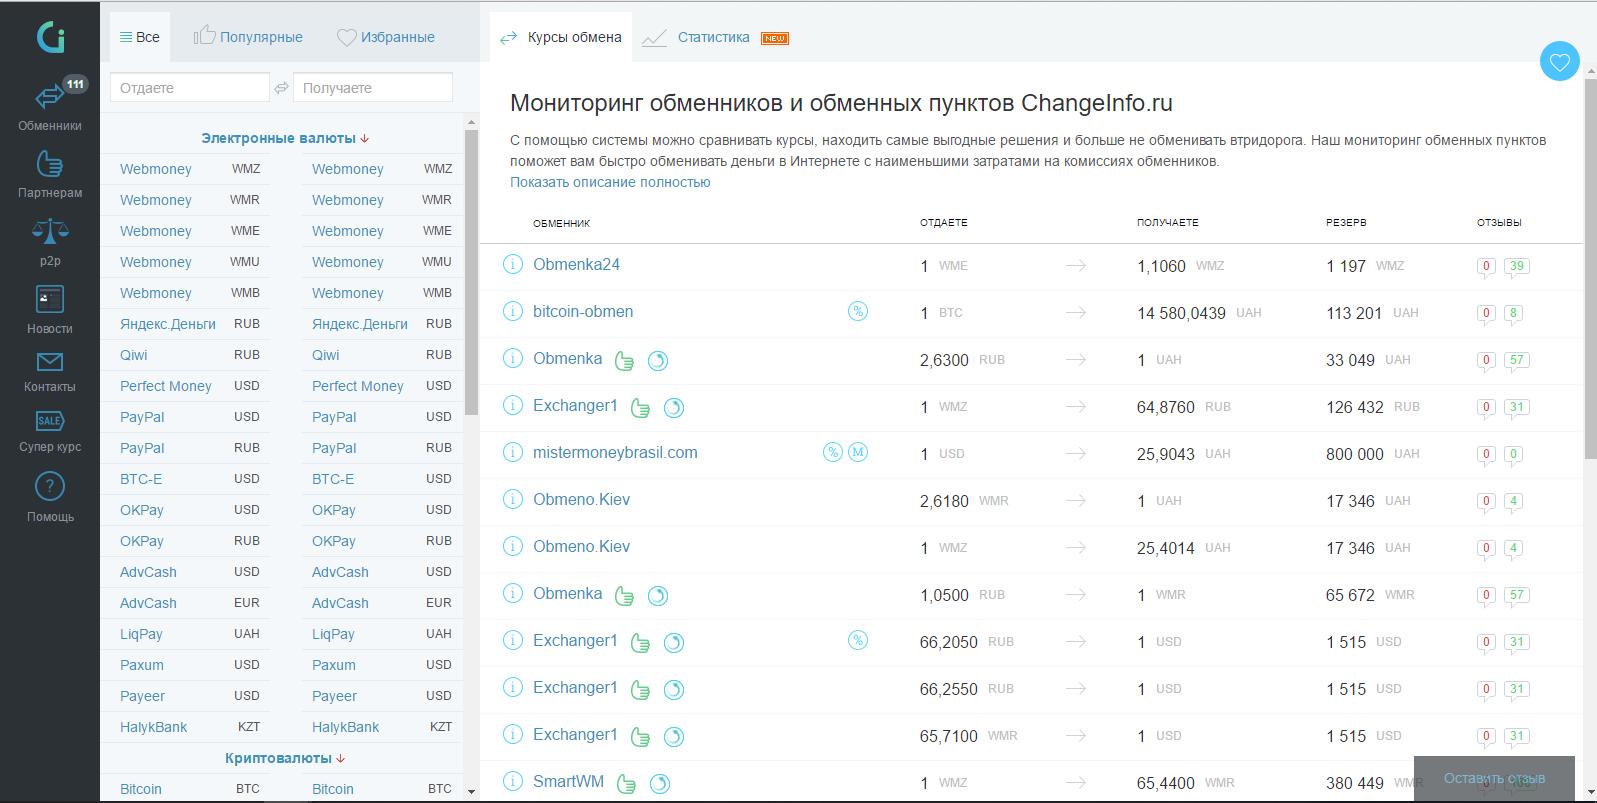 обмен webmoney changeinfo.ru